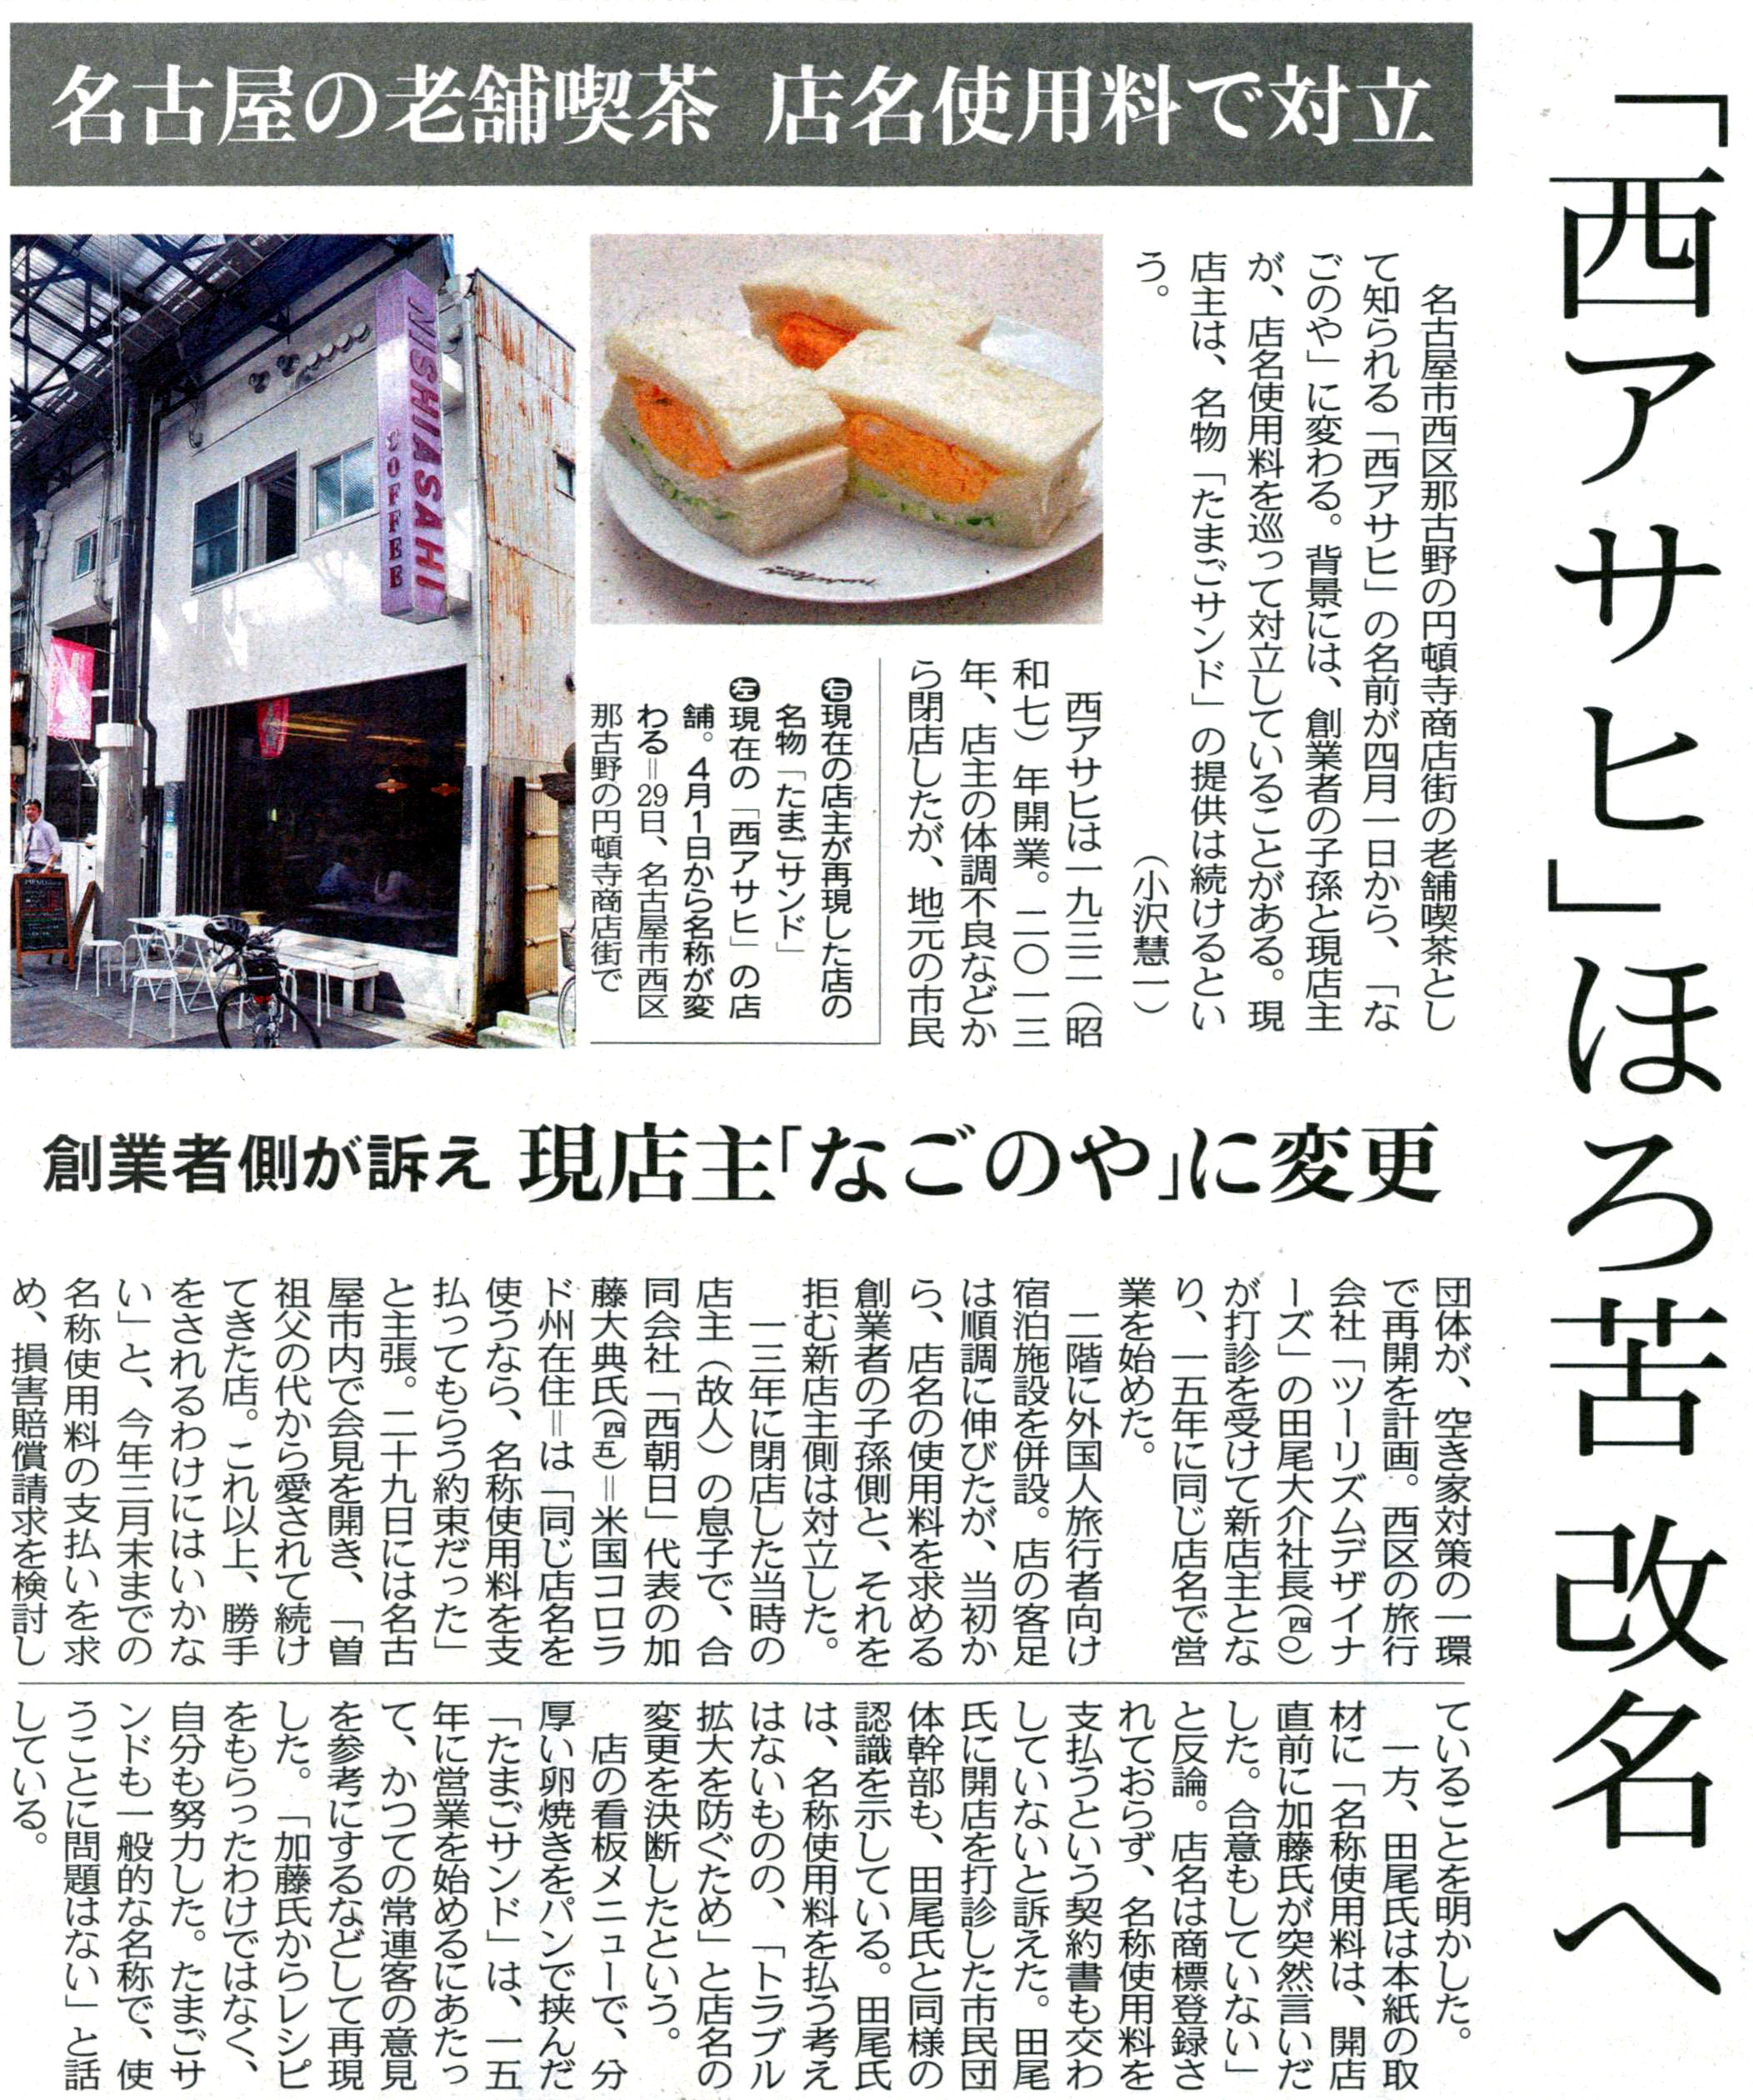 https://img.atwikiimg.com/www45.atwiki.jp/jippensha/attach/93/7315/14_endouji%20kissa.jpg